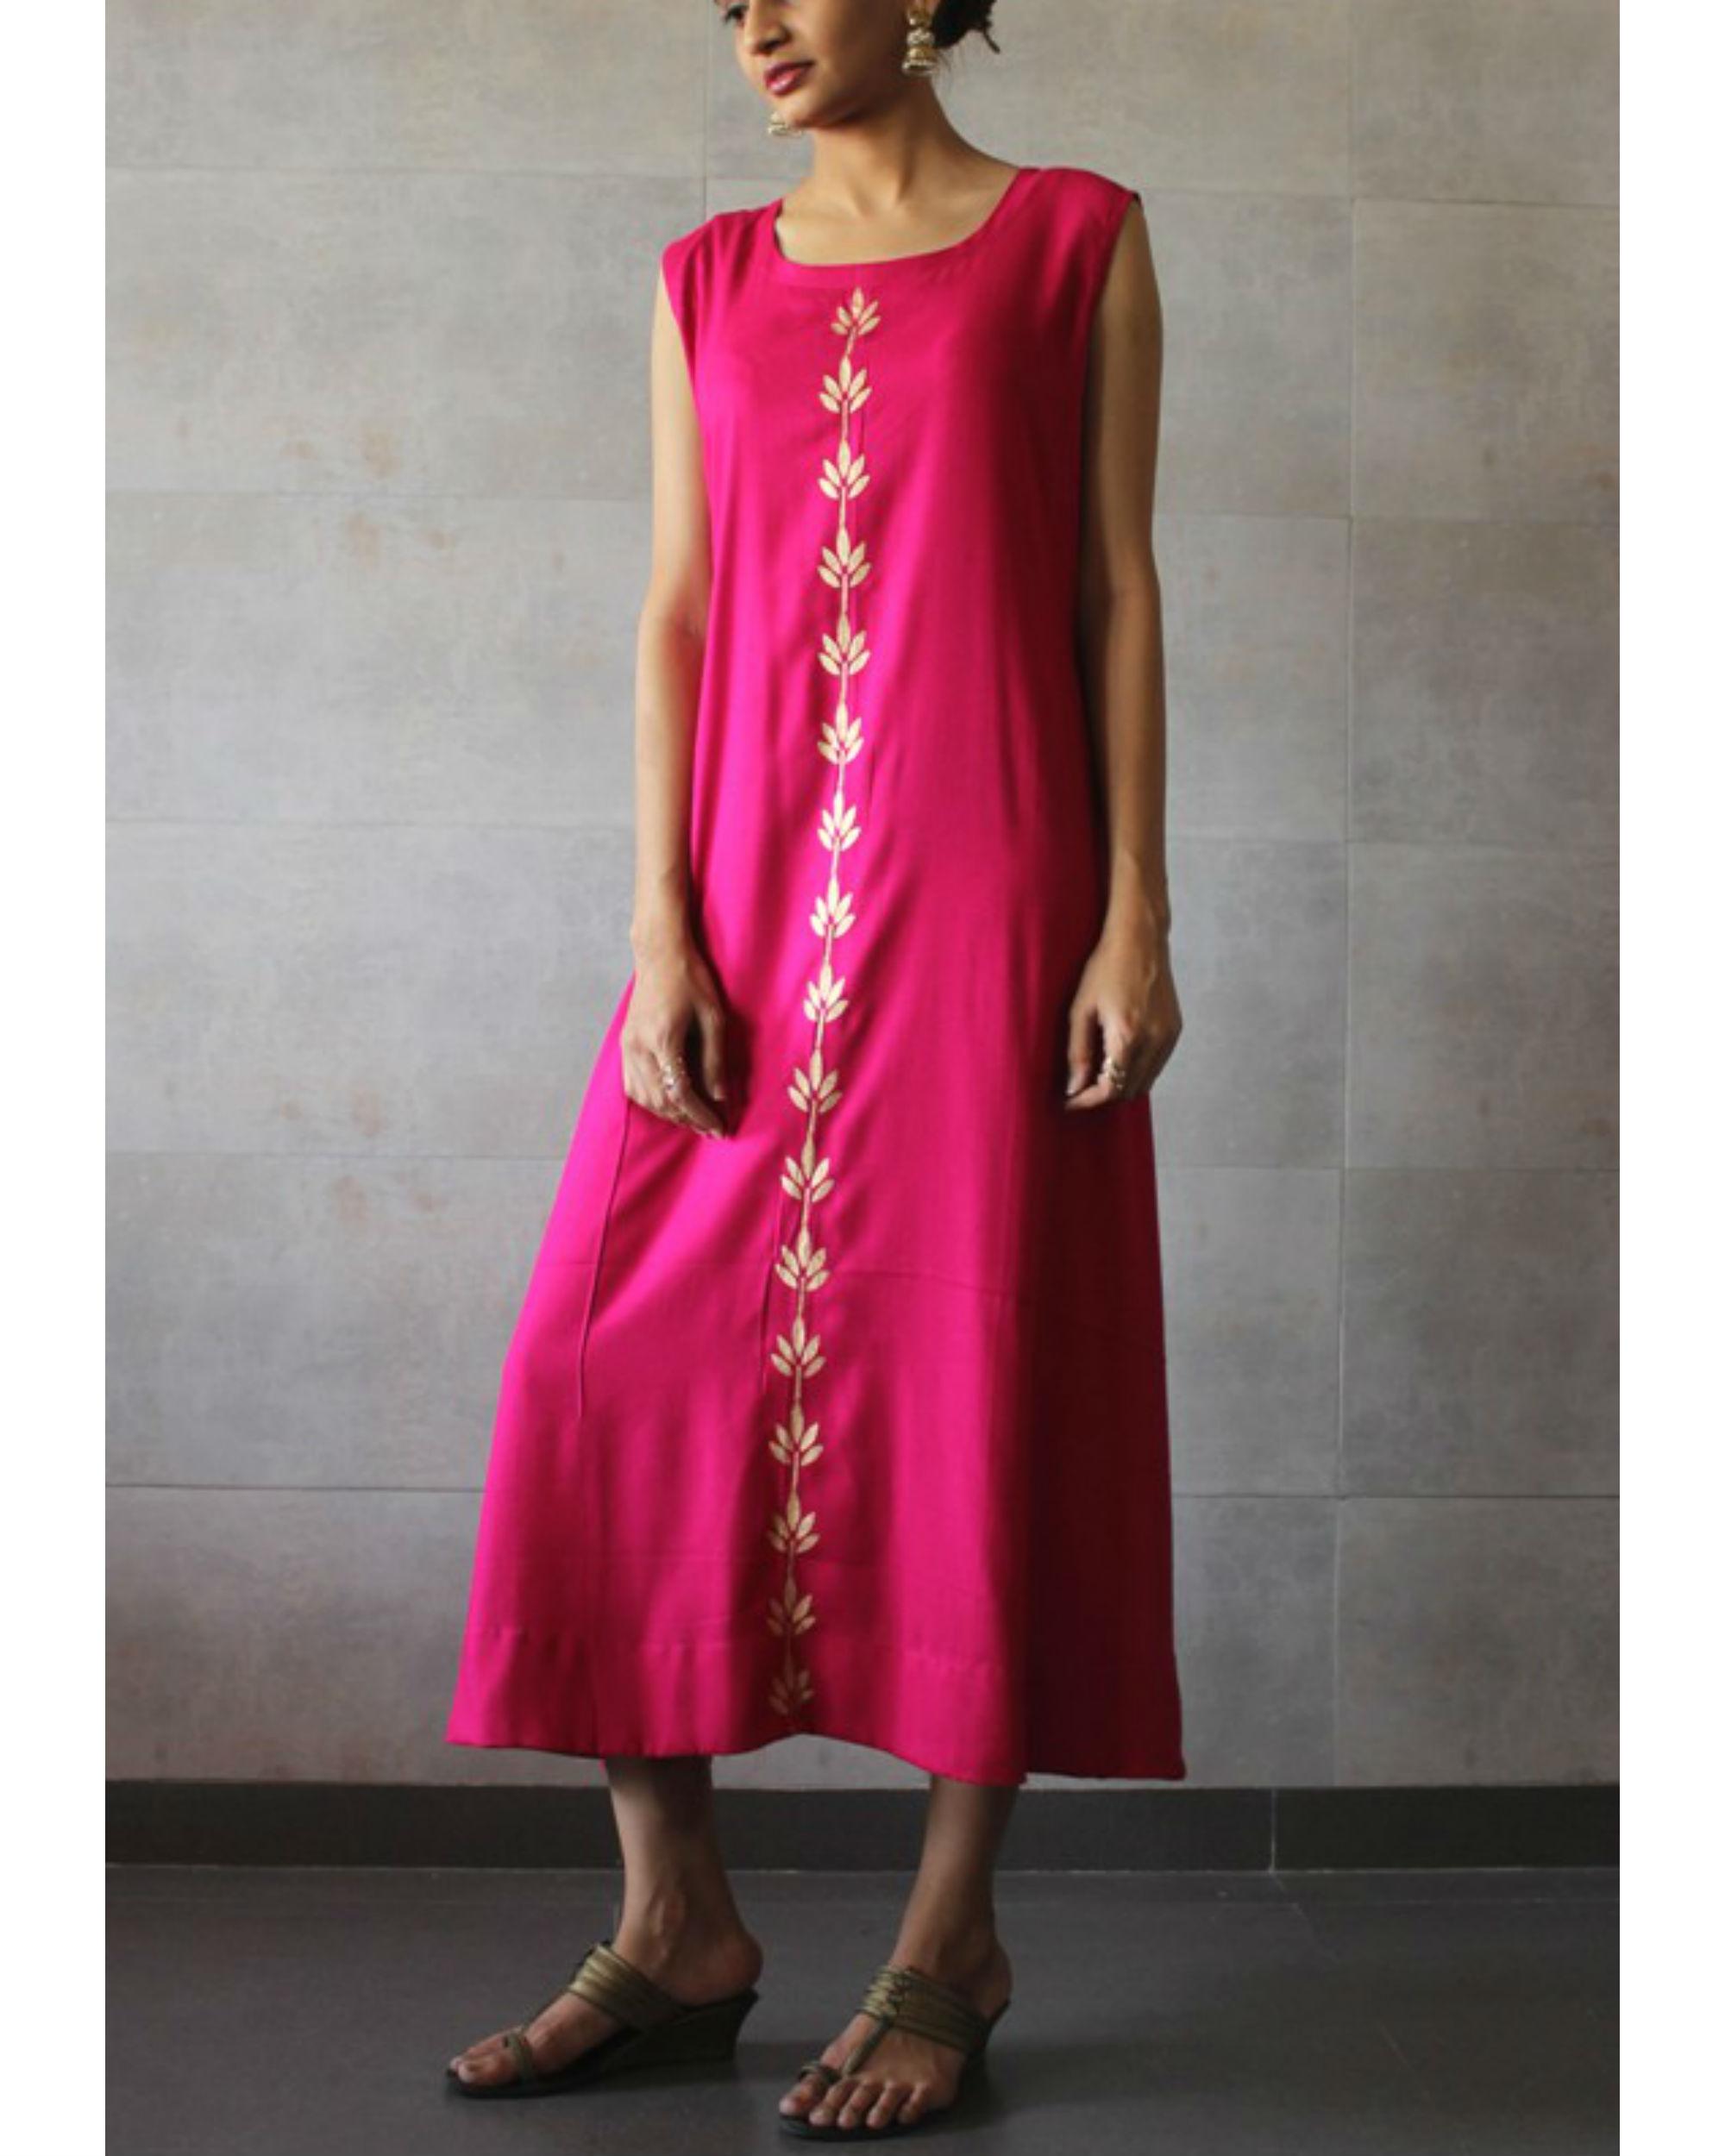 Hot pink sleeveless a-line kurta